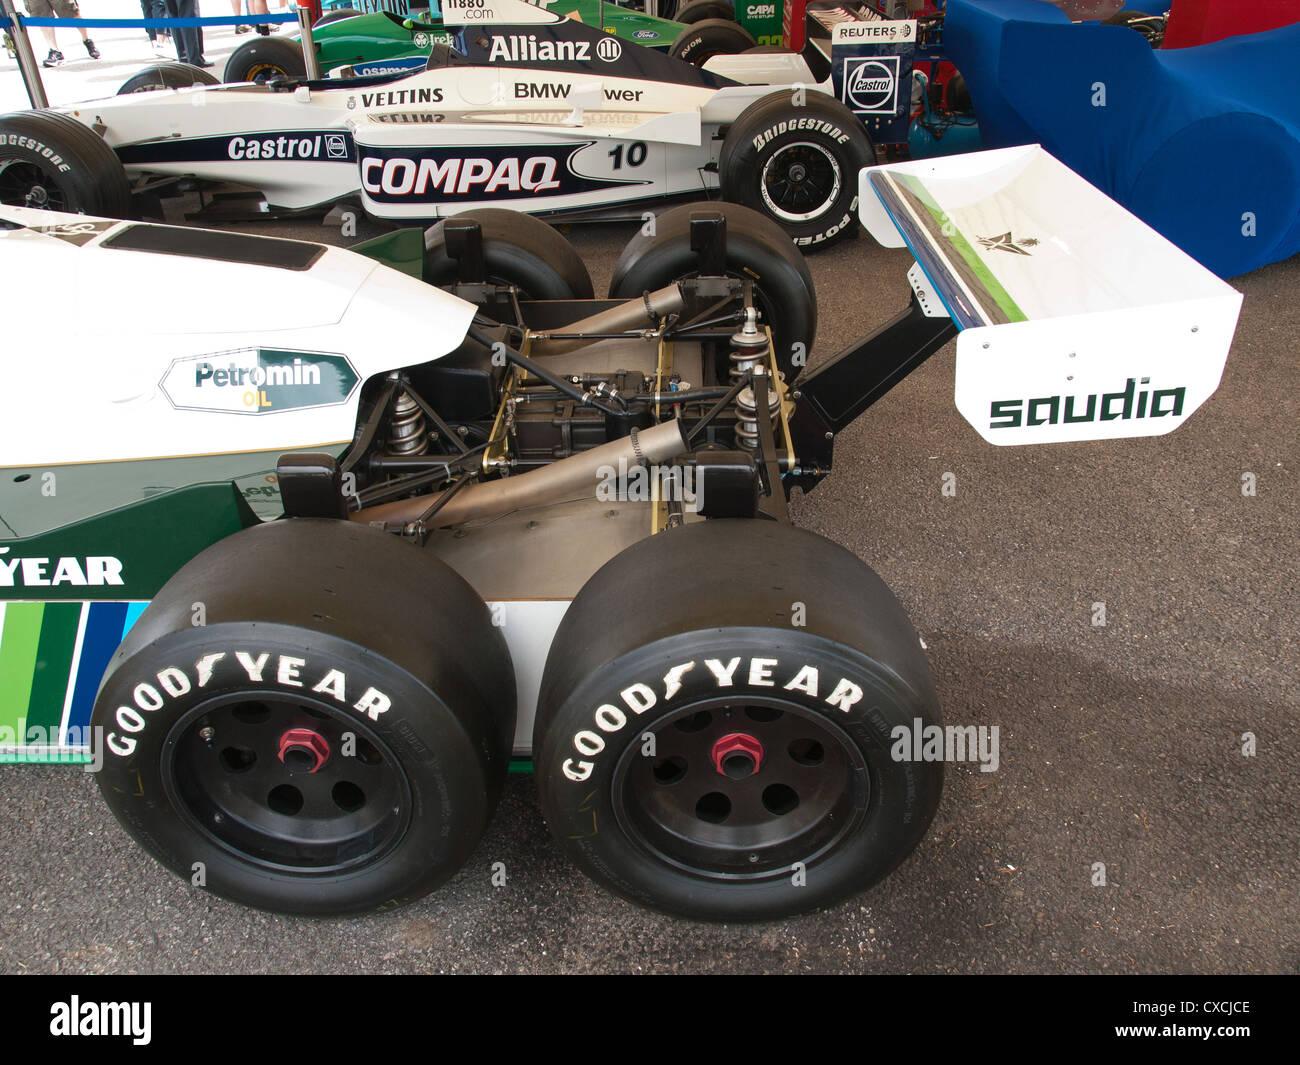 Williams 6 Rad F1 Rennwagen Goodwood Festival Of Speed England UK 2012 Stockbild